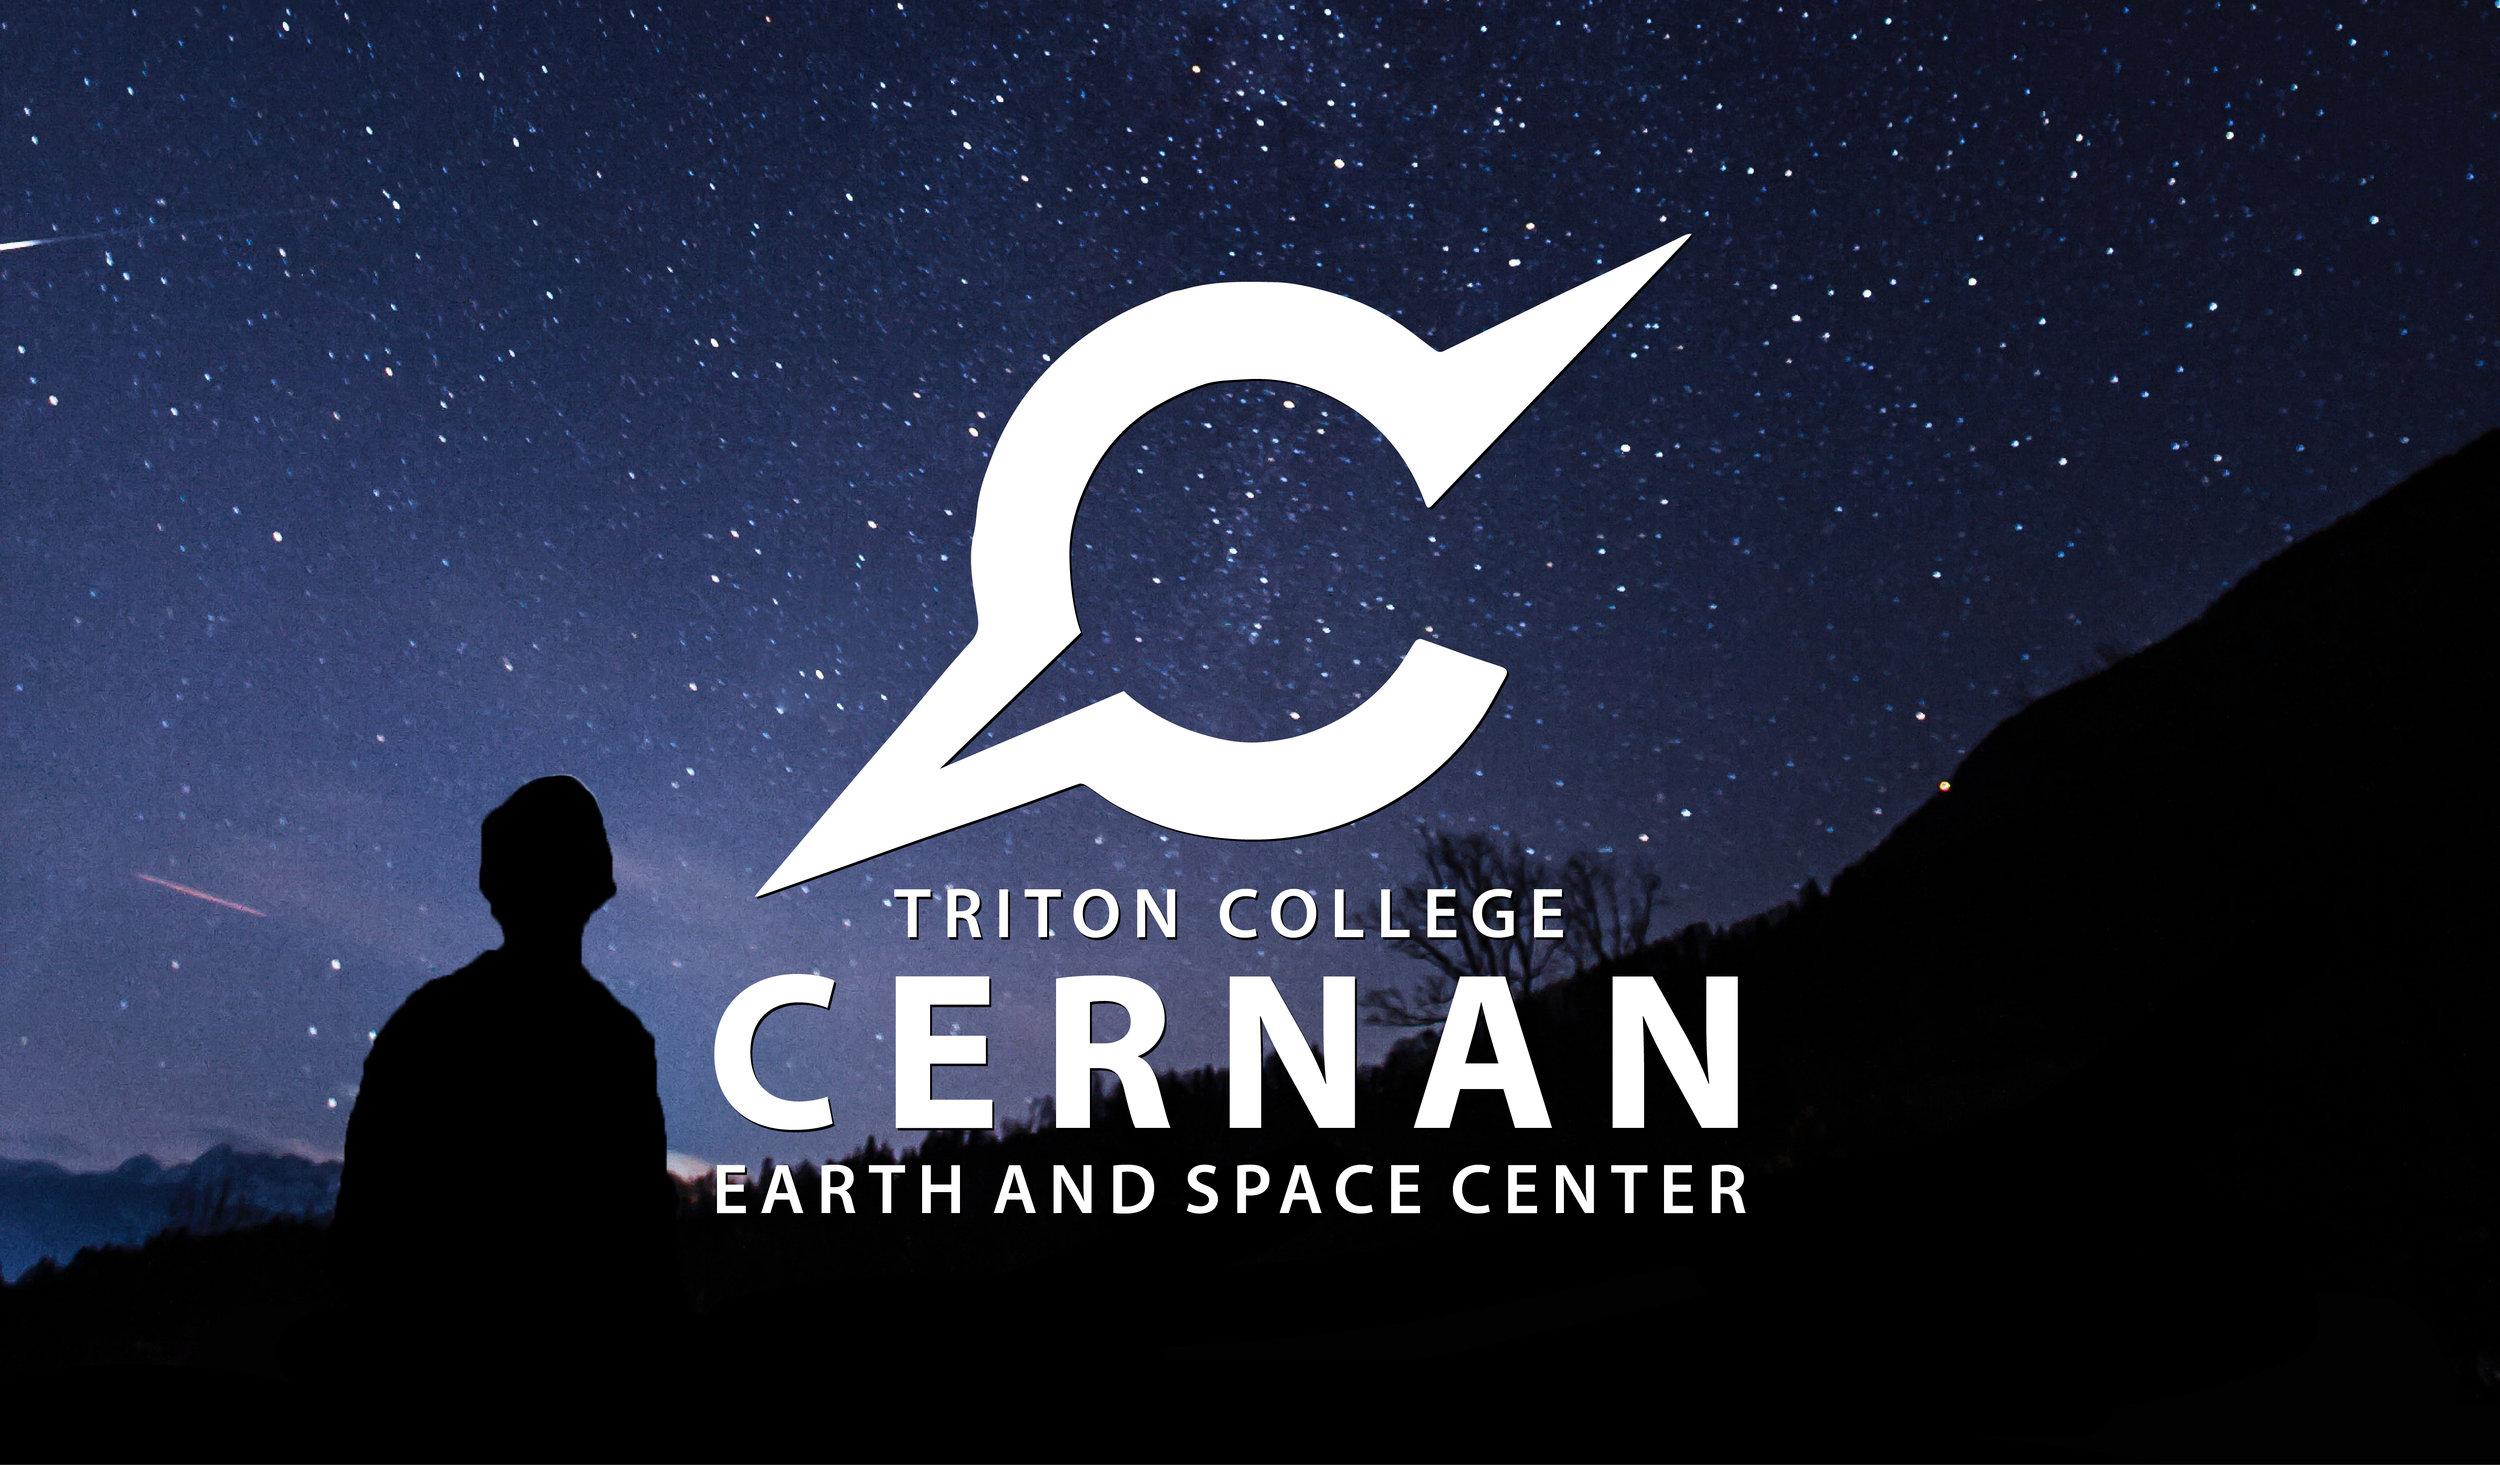 Cernan Space Center (Triton College) Adventure.jpg